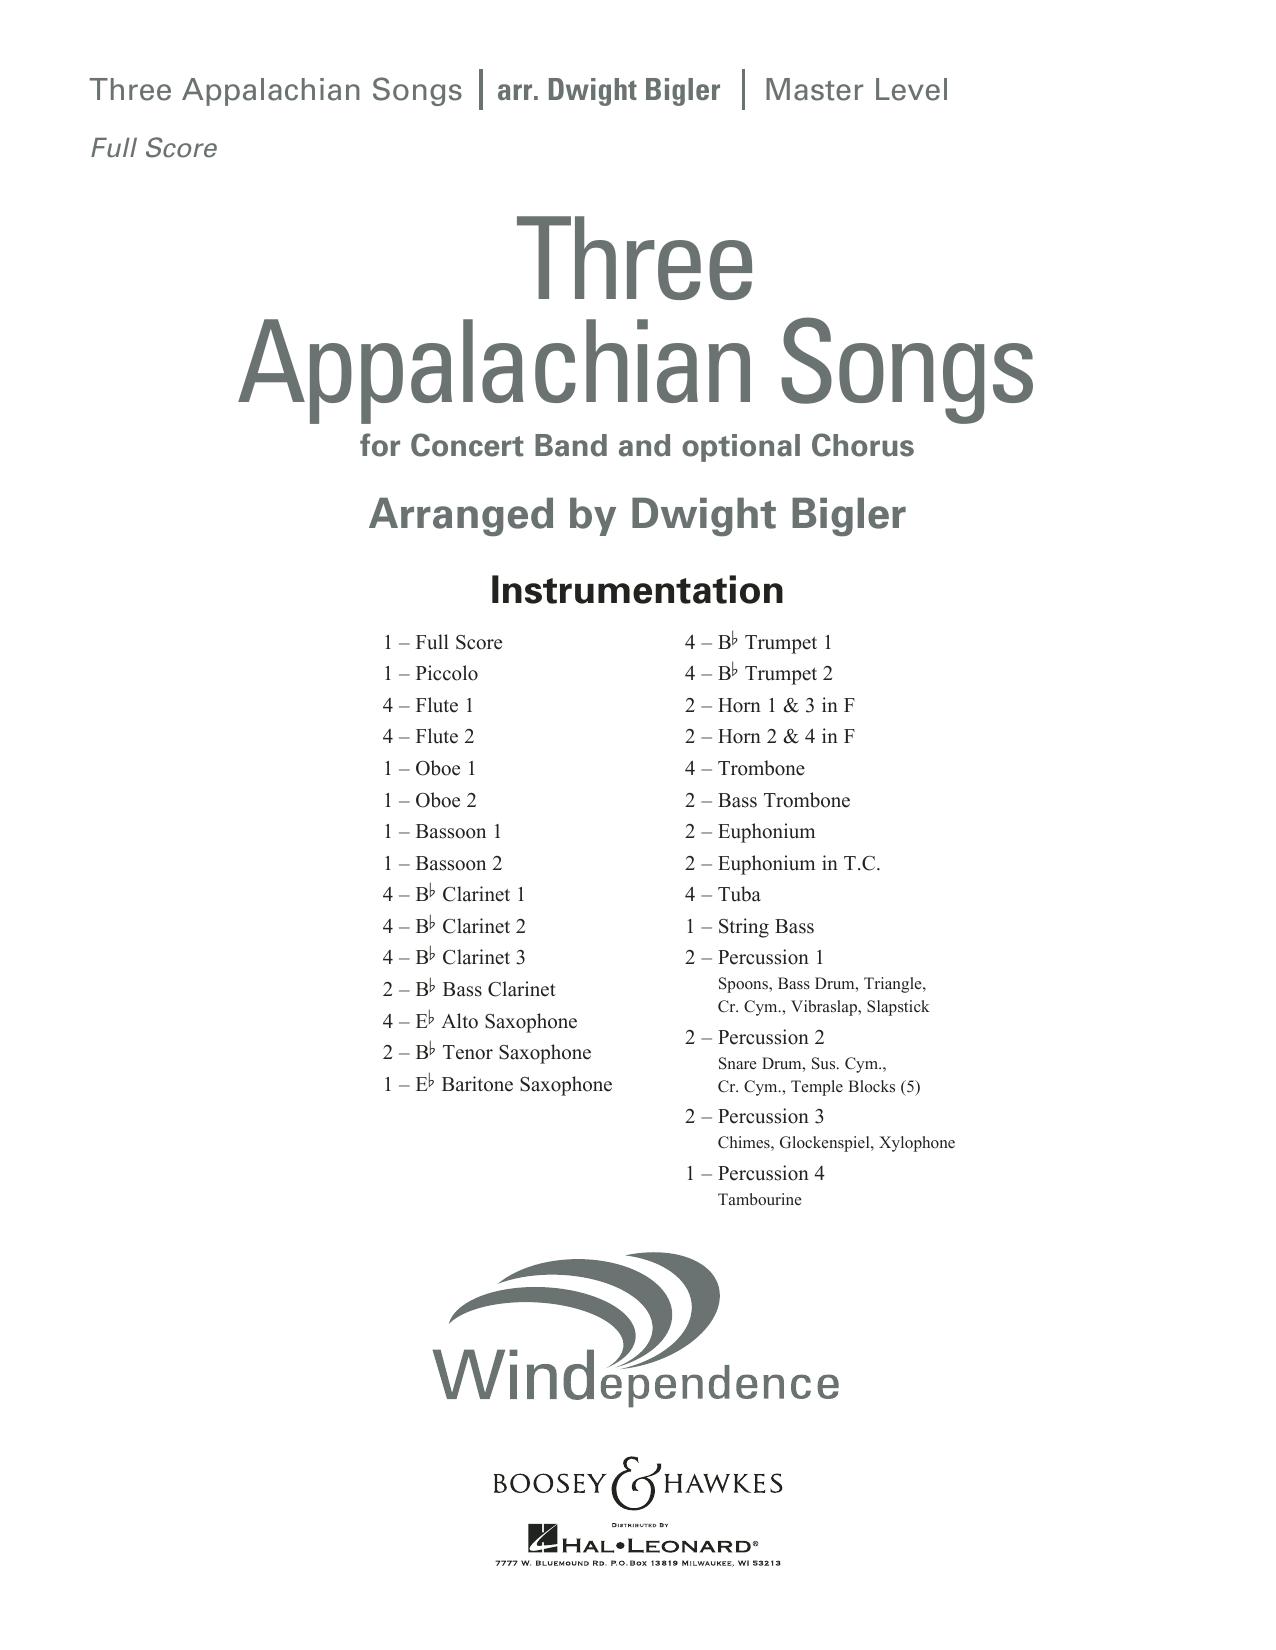 Three Appalachian Songs - Band Music Download